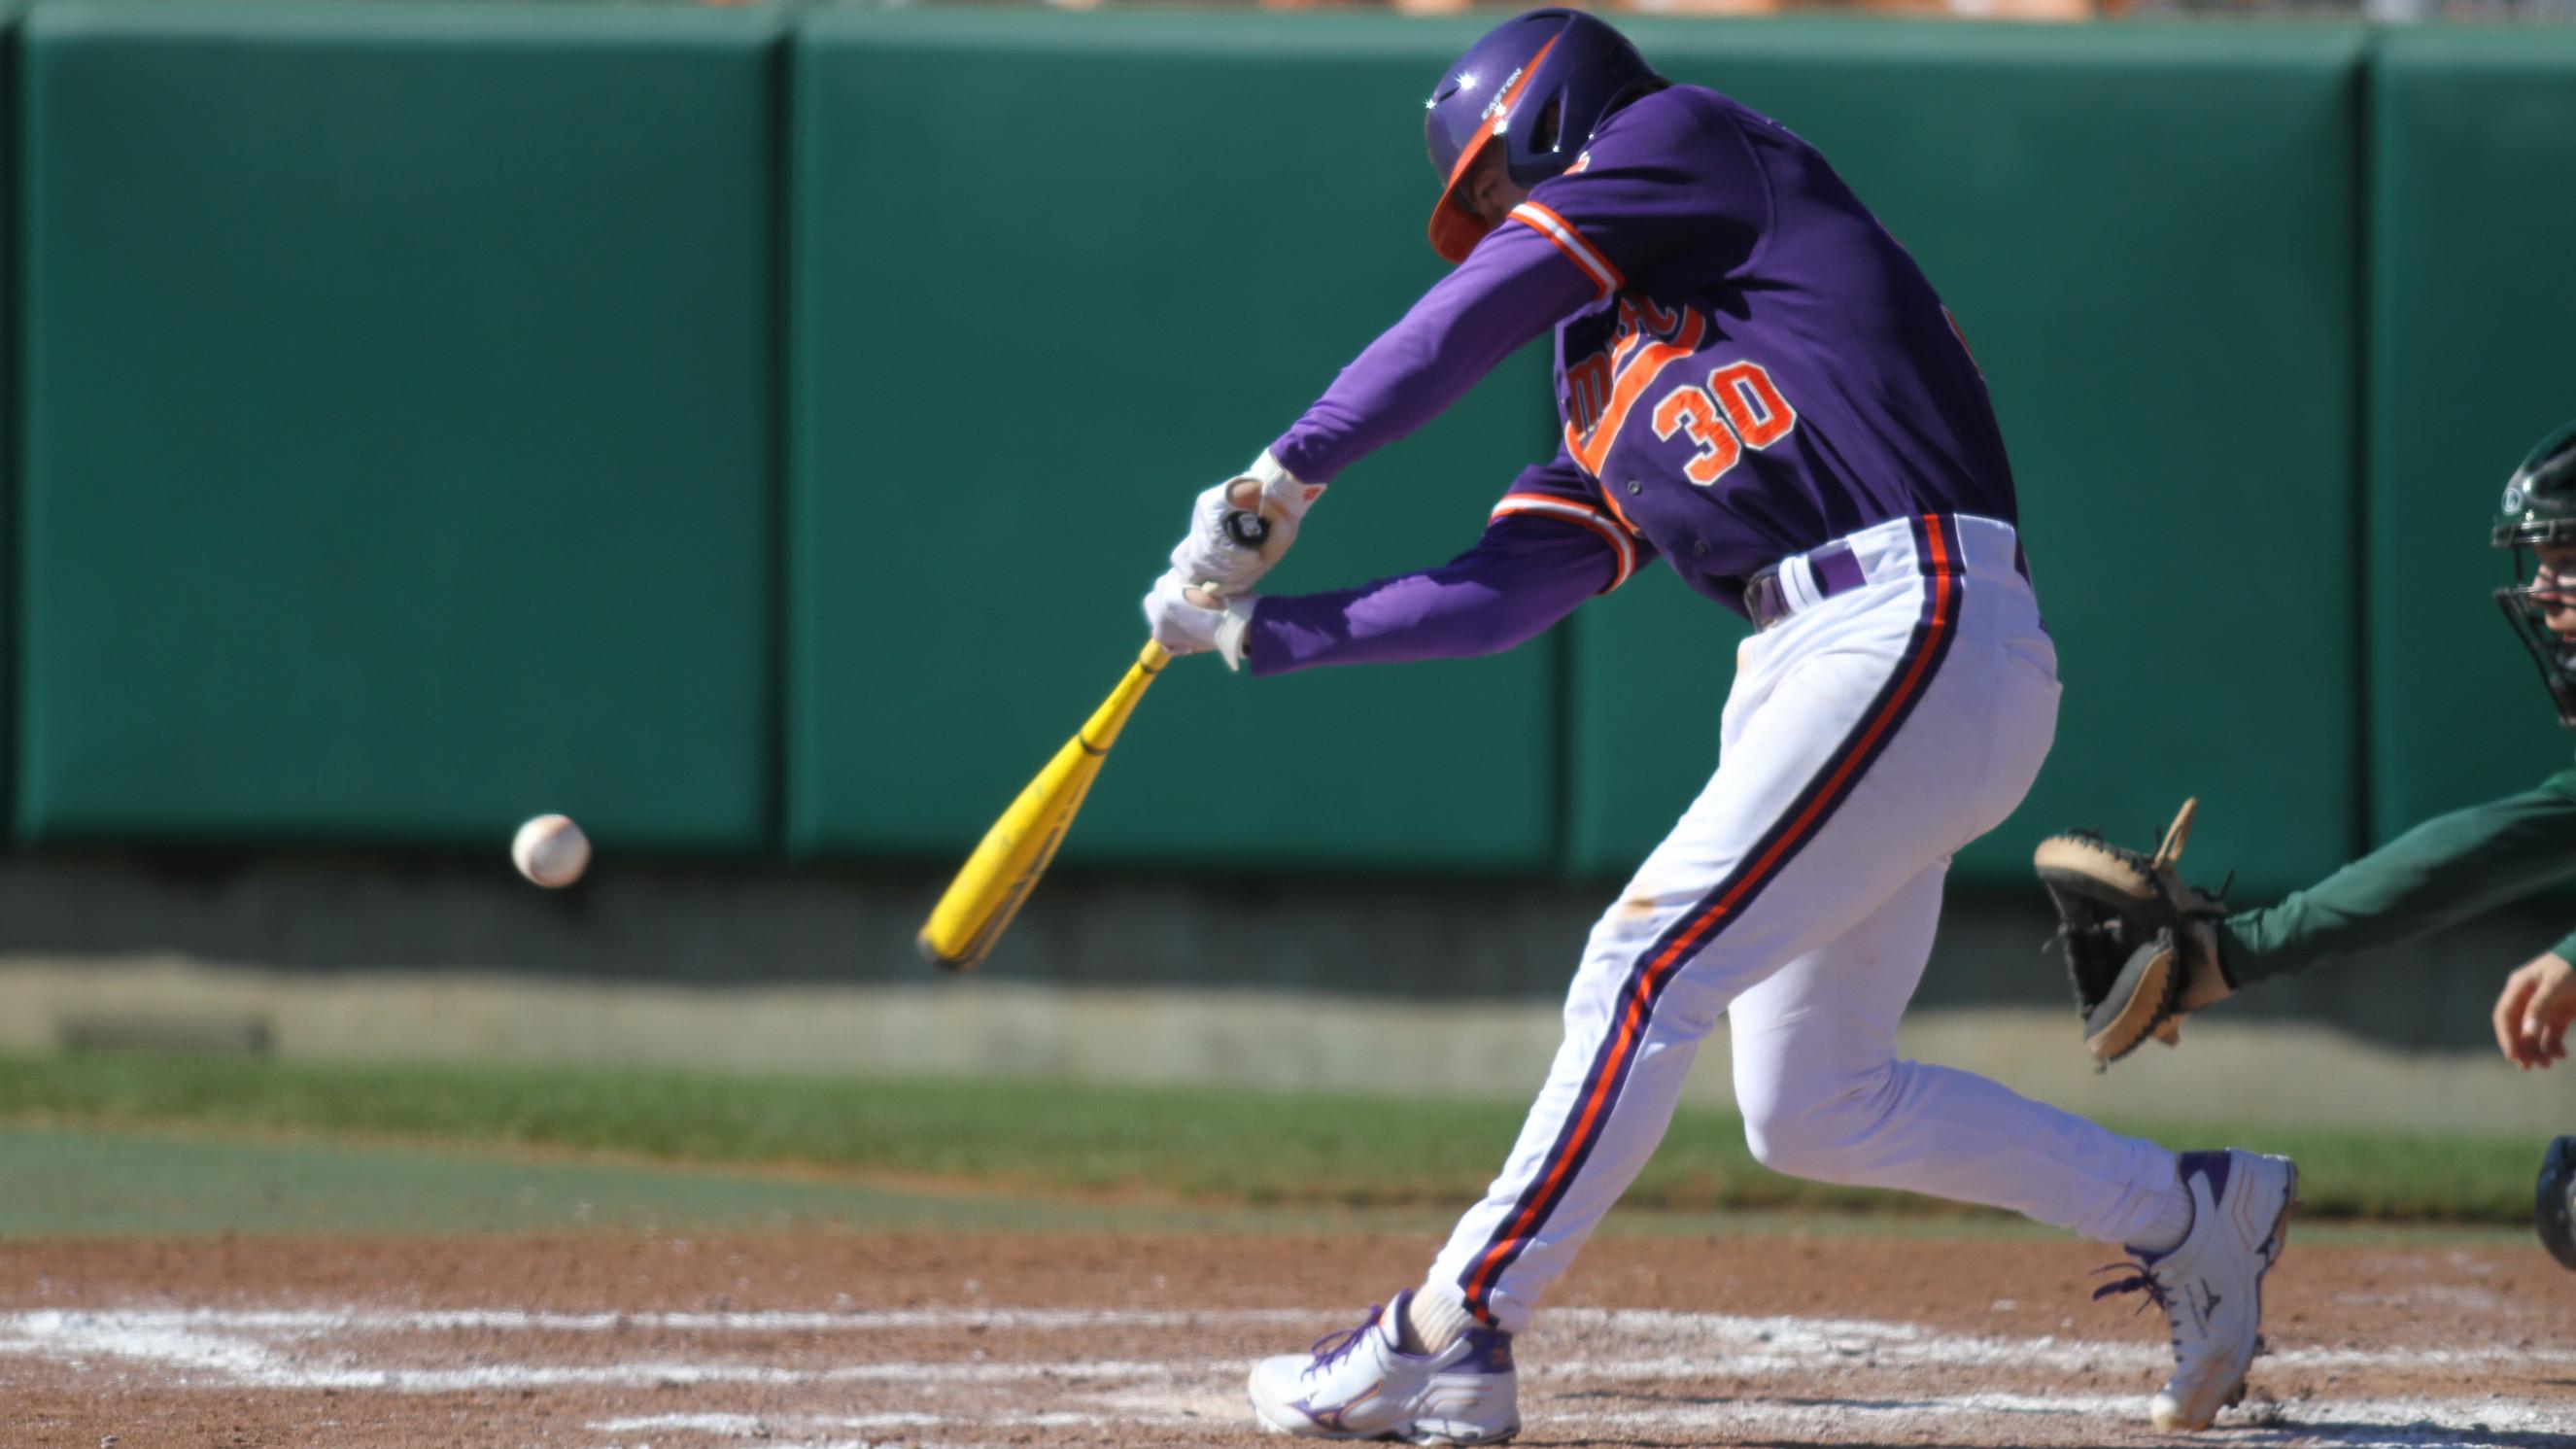 Tiger Baseball Team to Play Host to #12 Virginia Friday-Sunday